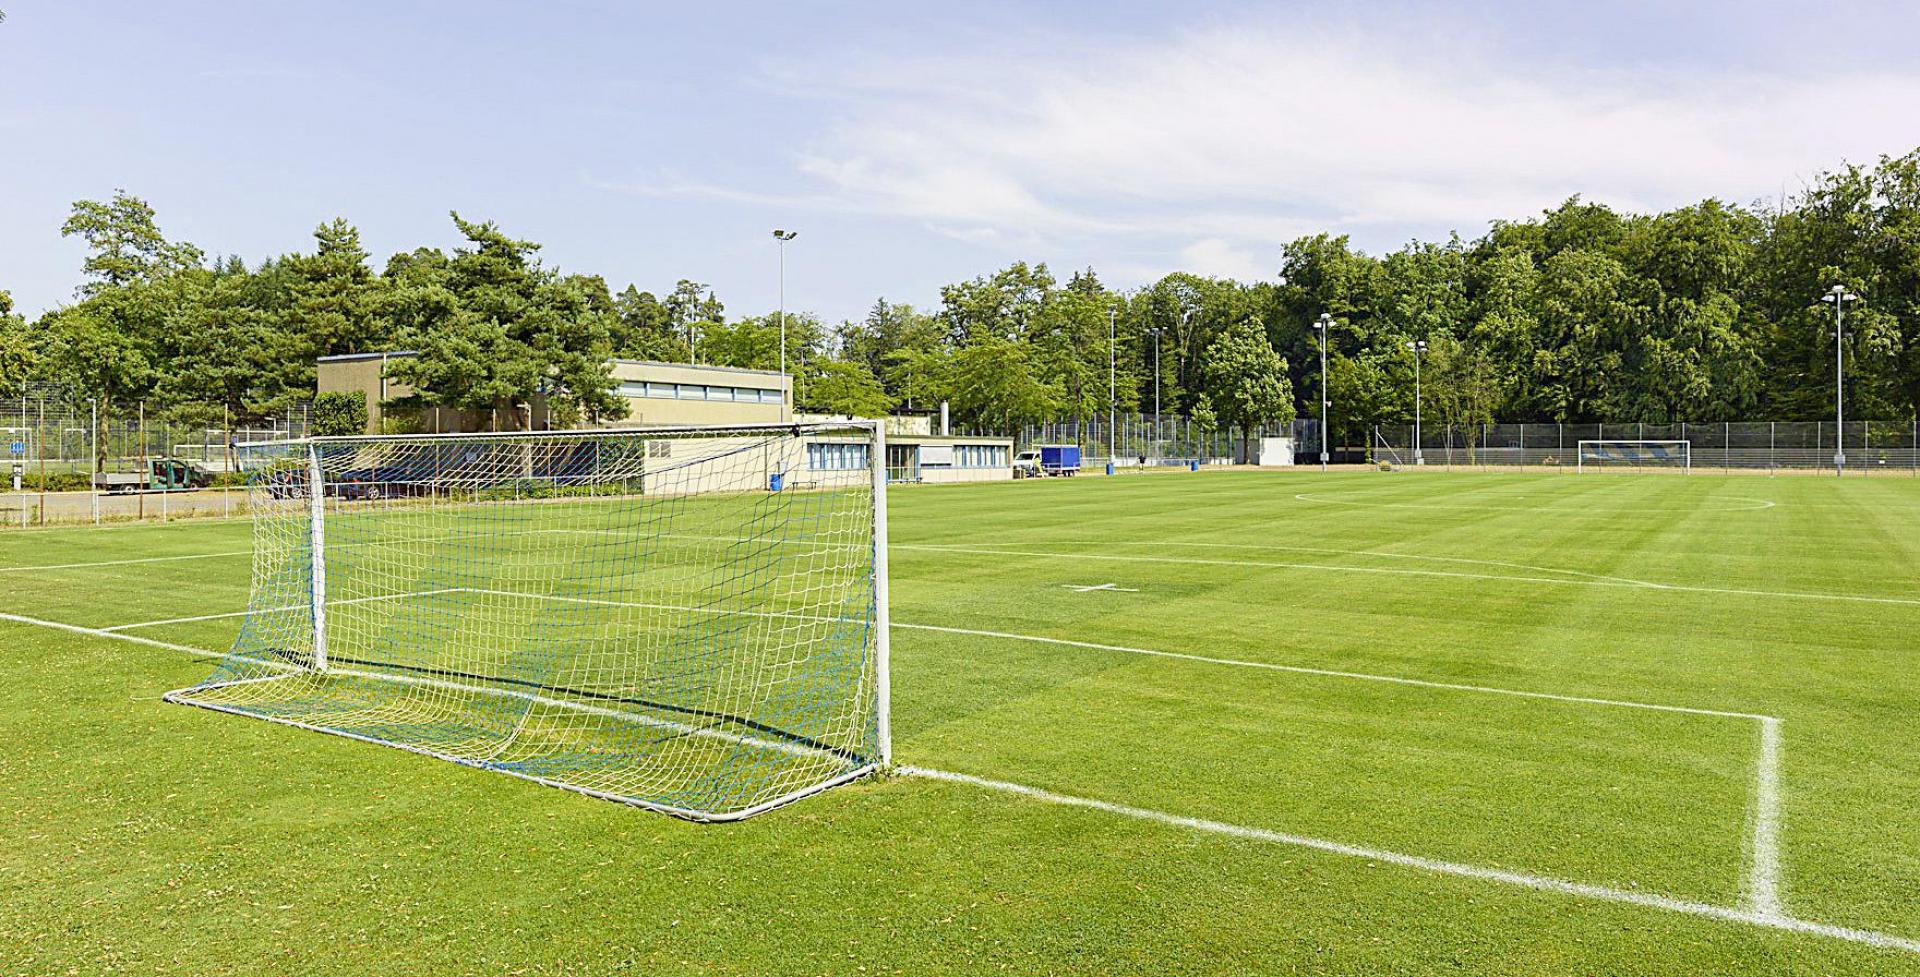 Spiel der Woche: 2. Liga, Gruppe 2, SC Bümpliz – FC Köniz